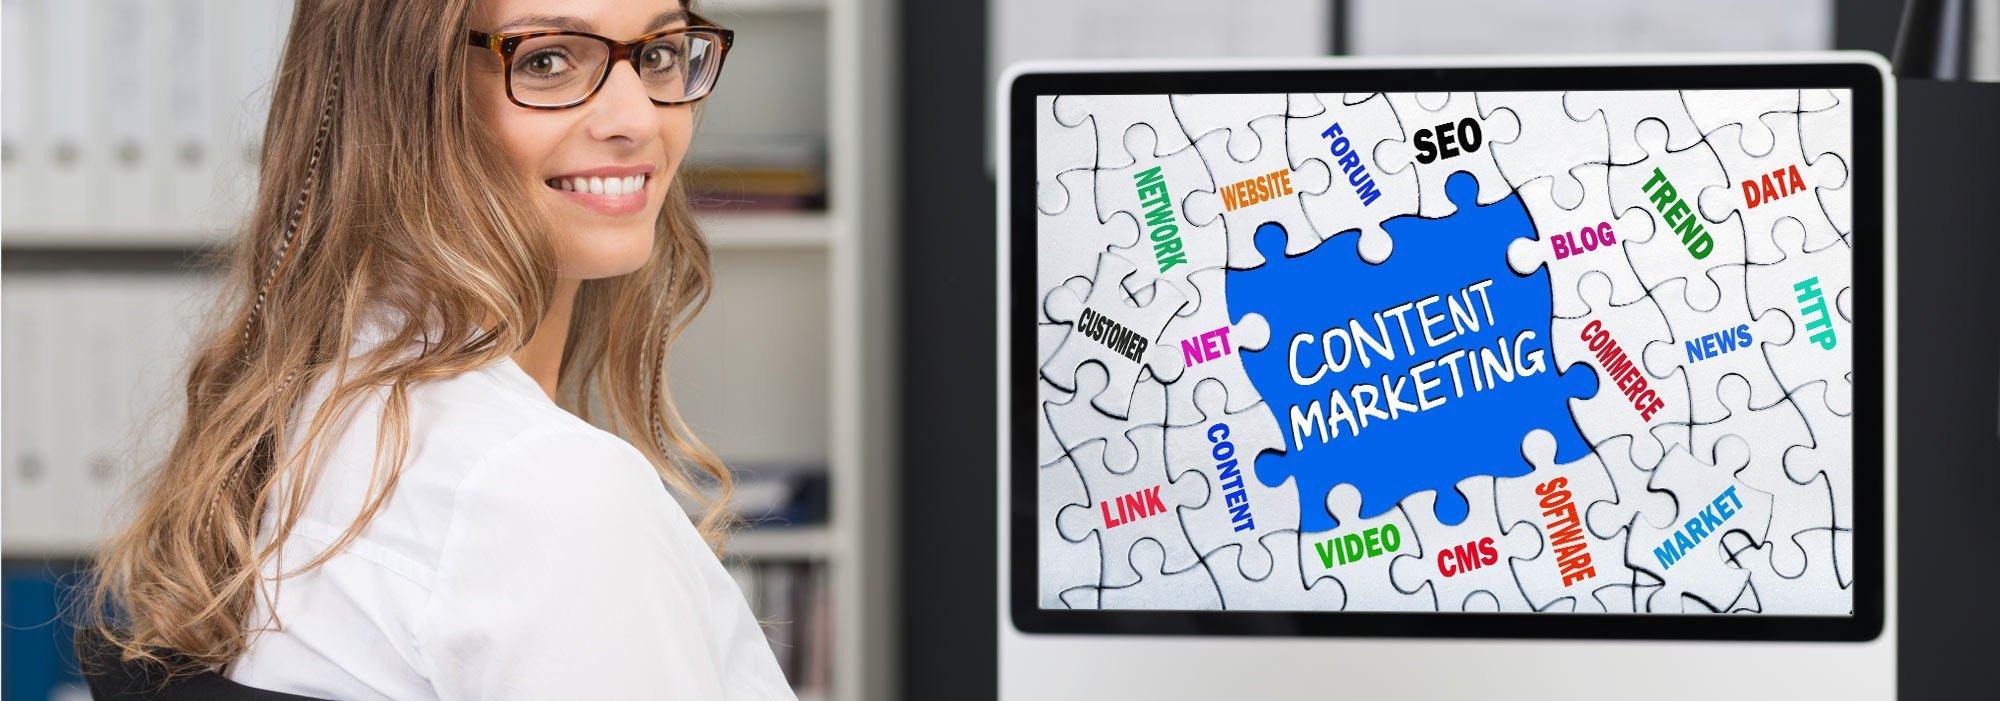 Content Marketing Company - Solution Web Designs